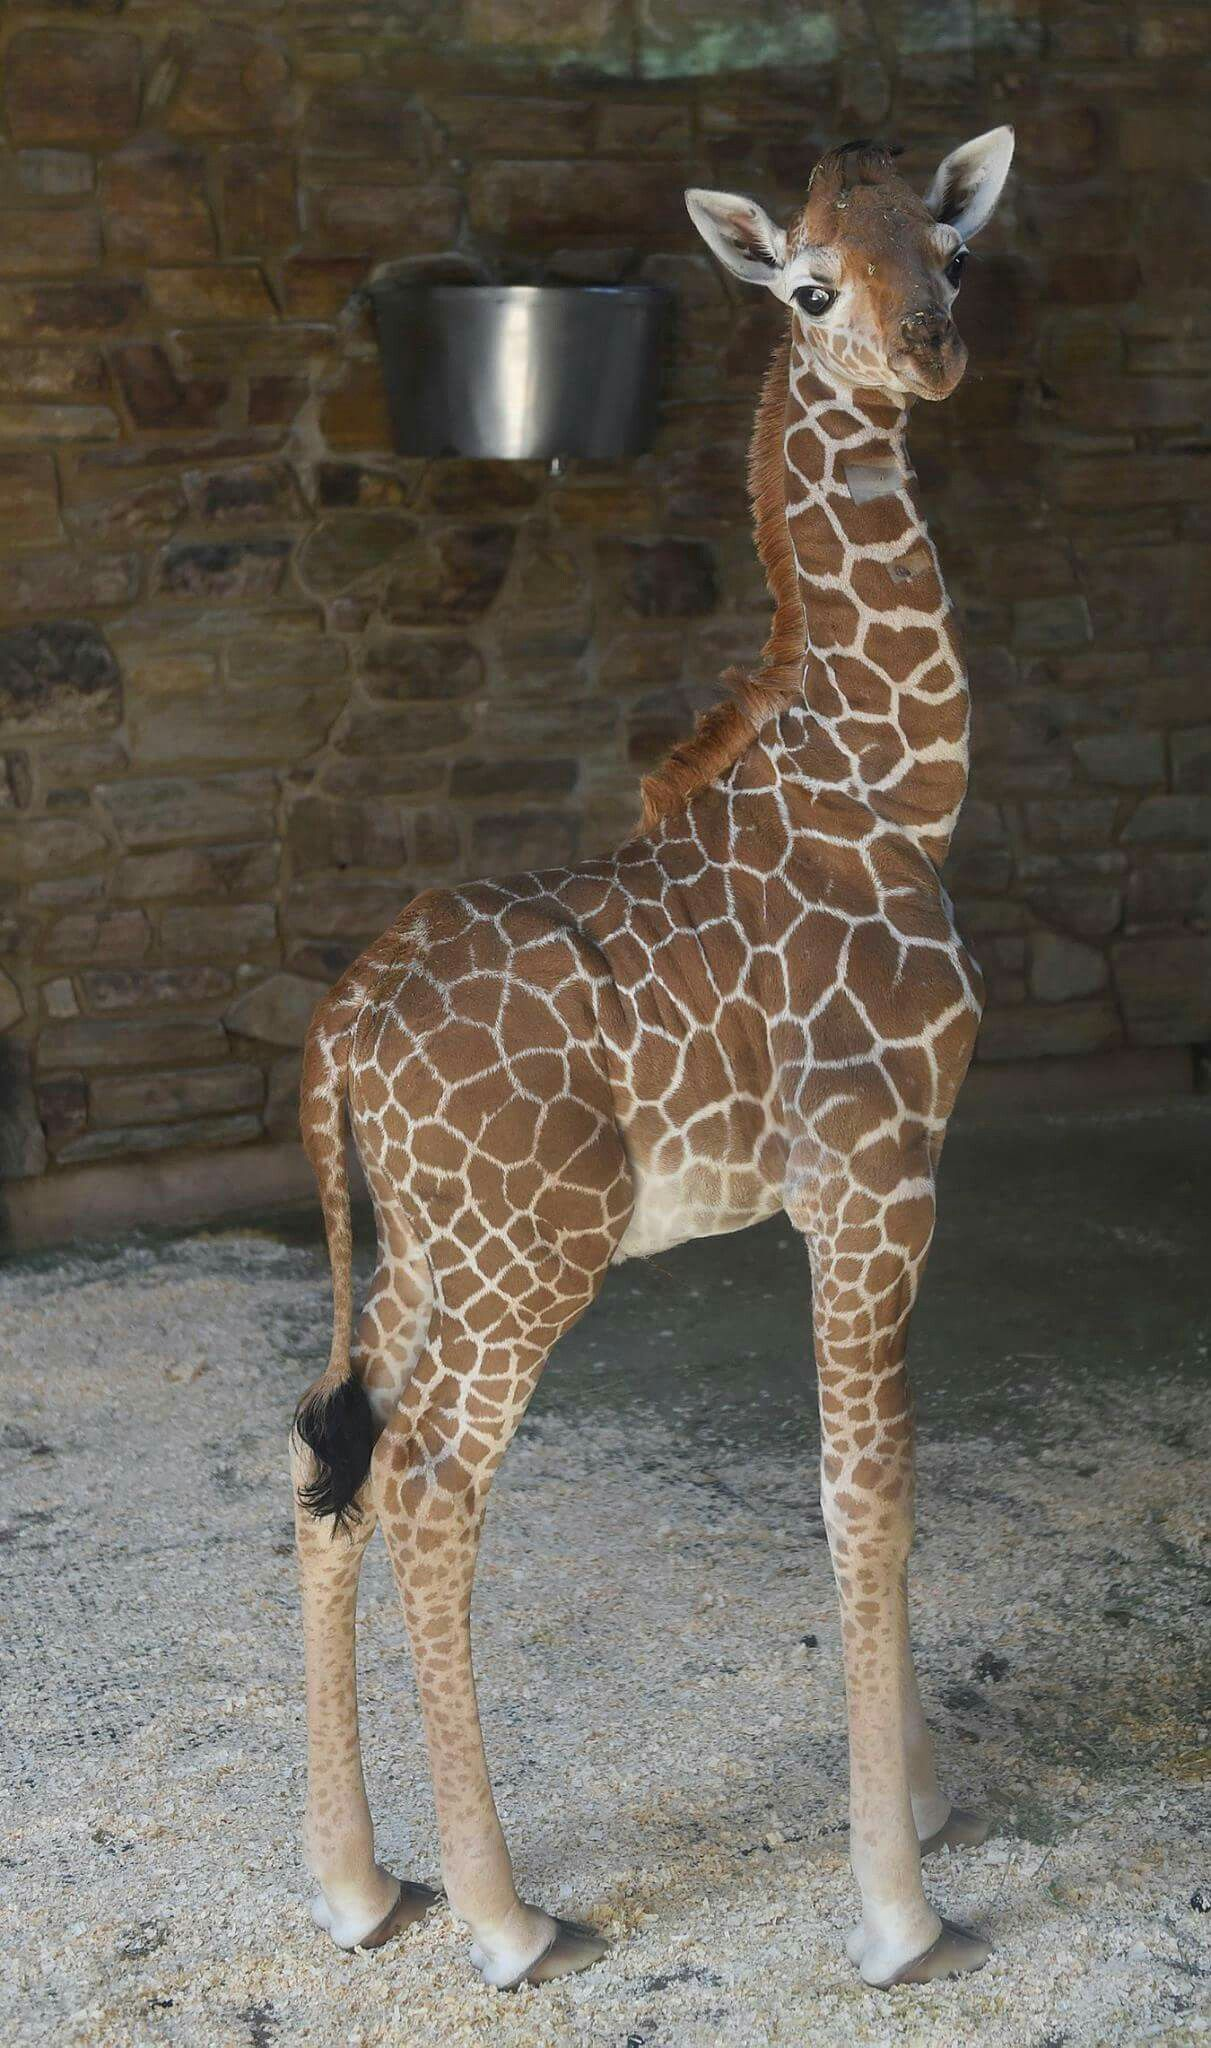 april the giraffe image by Debbie Motluck Giraffe